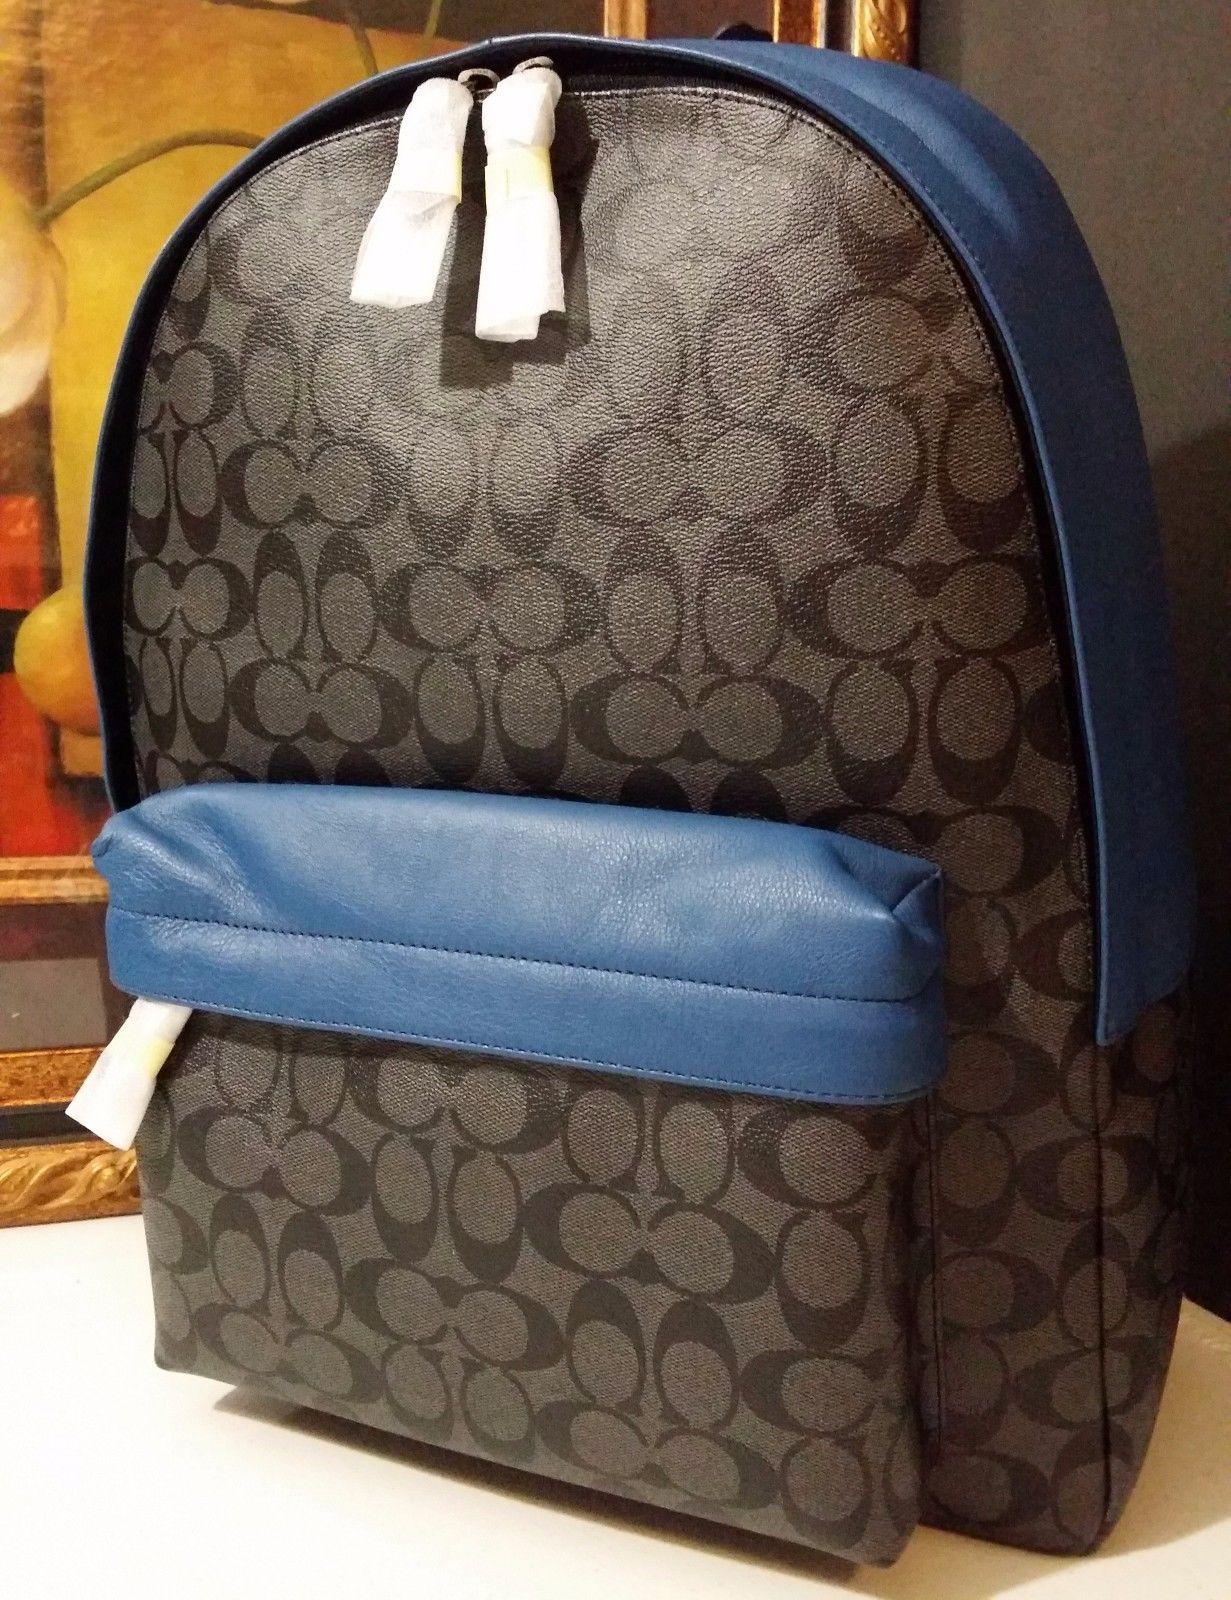 NWT COACH CAMPUS BACKPACK SIGNATURE PVC F71973 CHARCOAL/DENIM $495